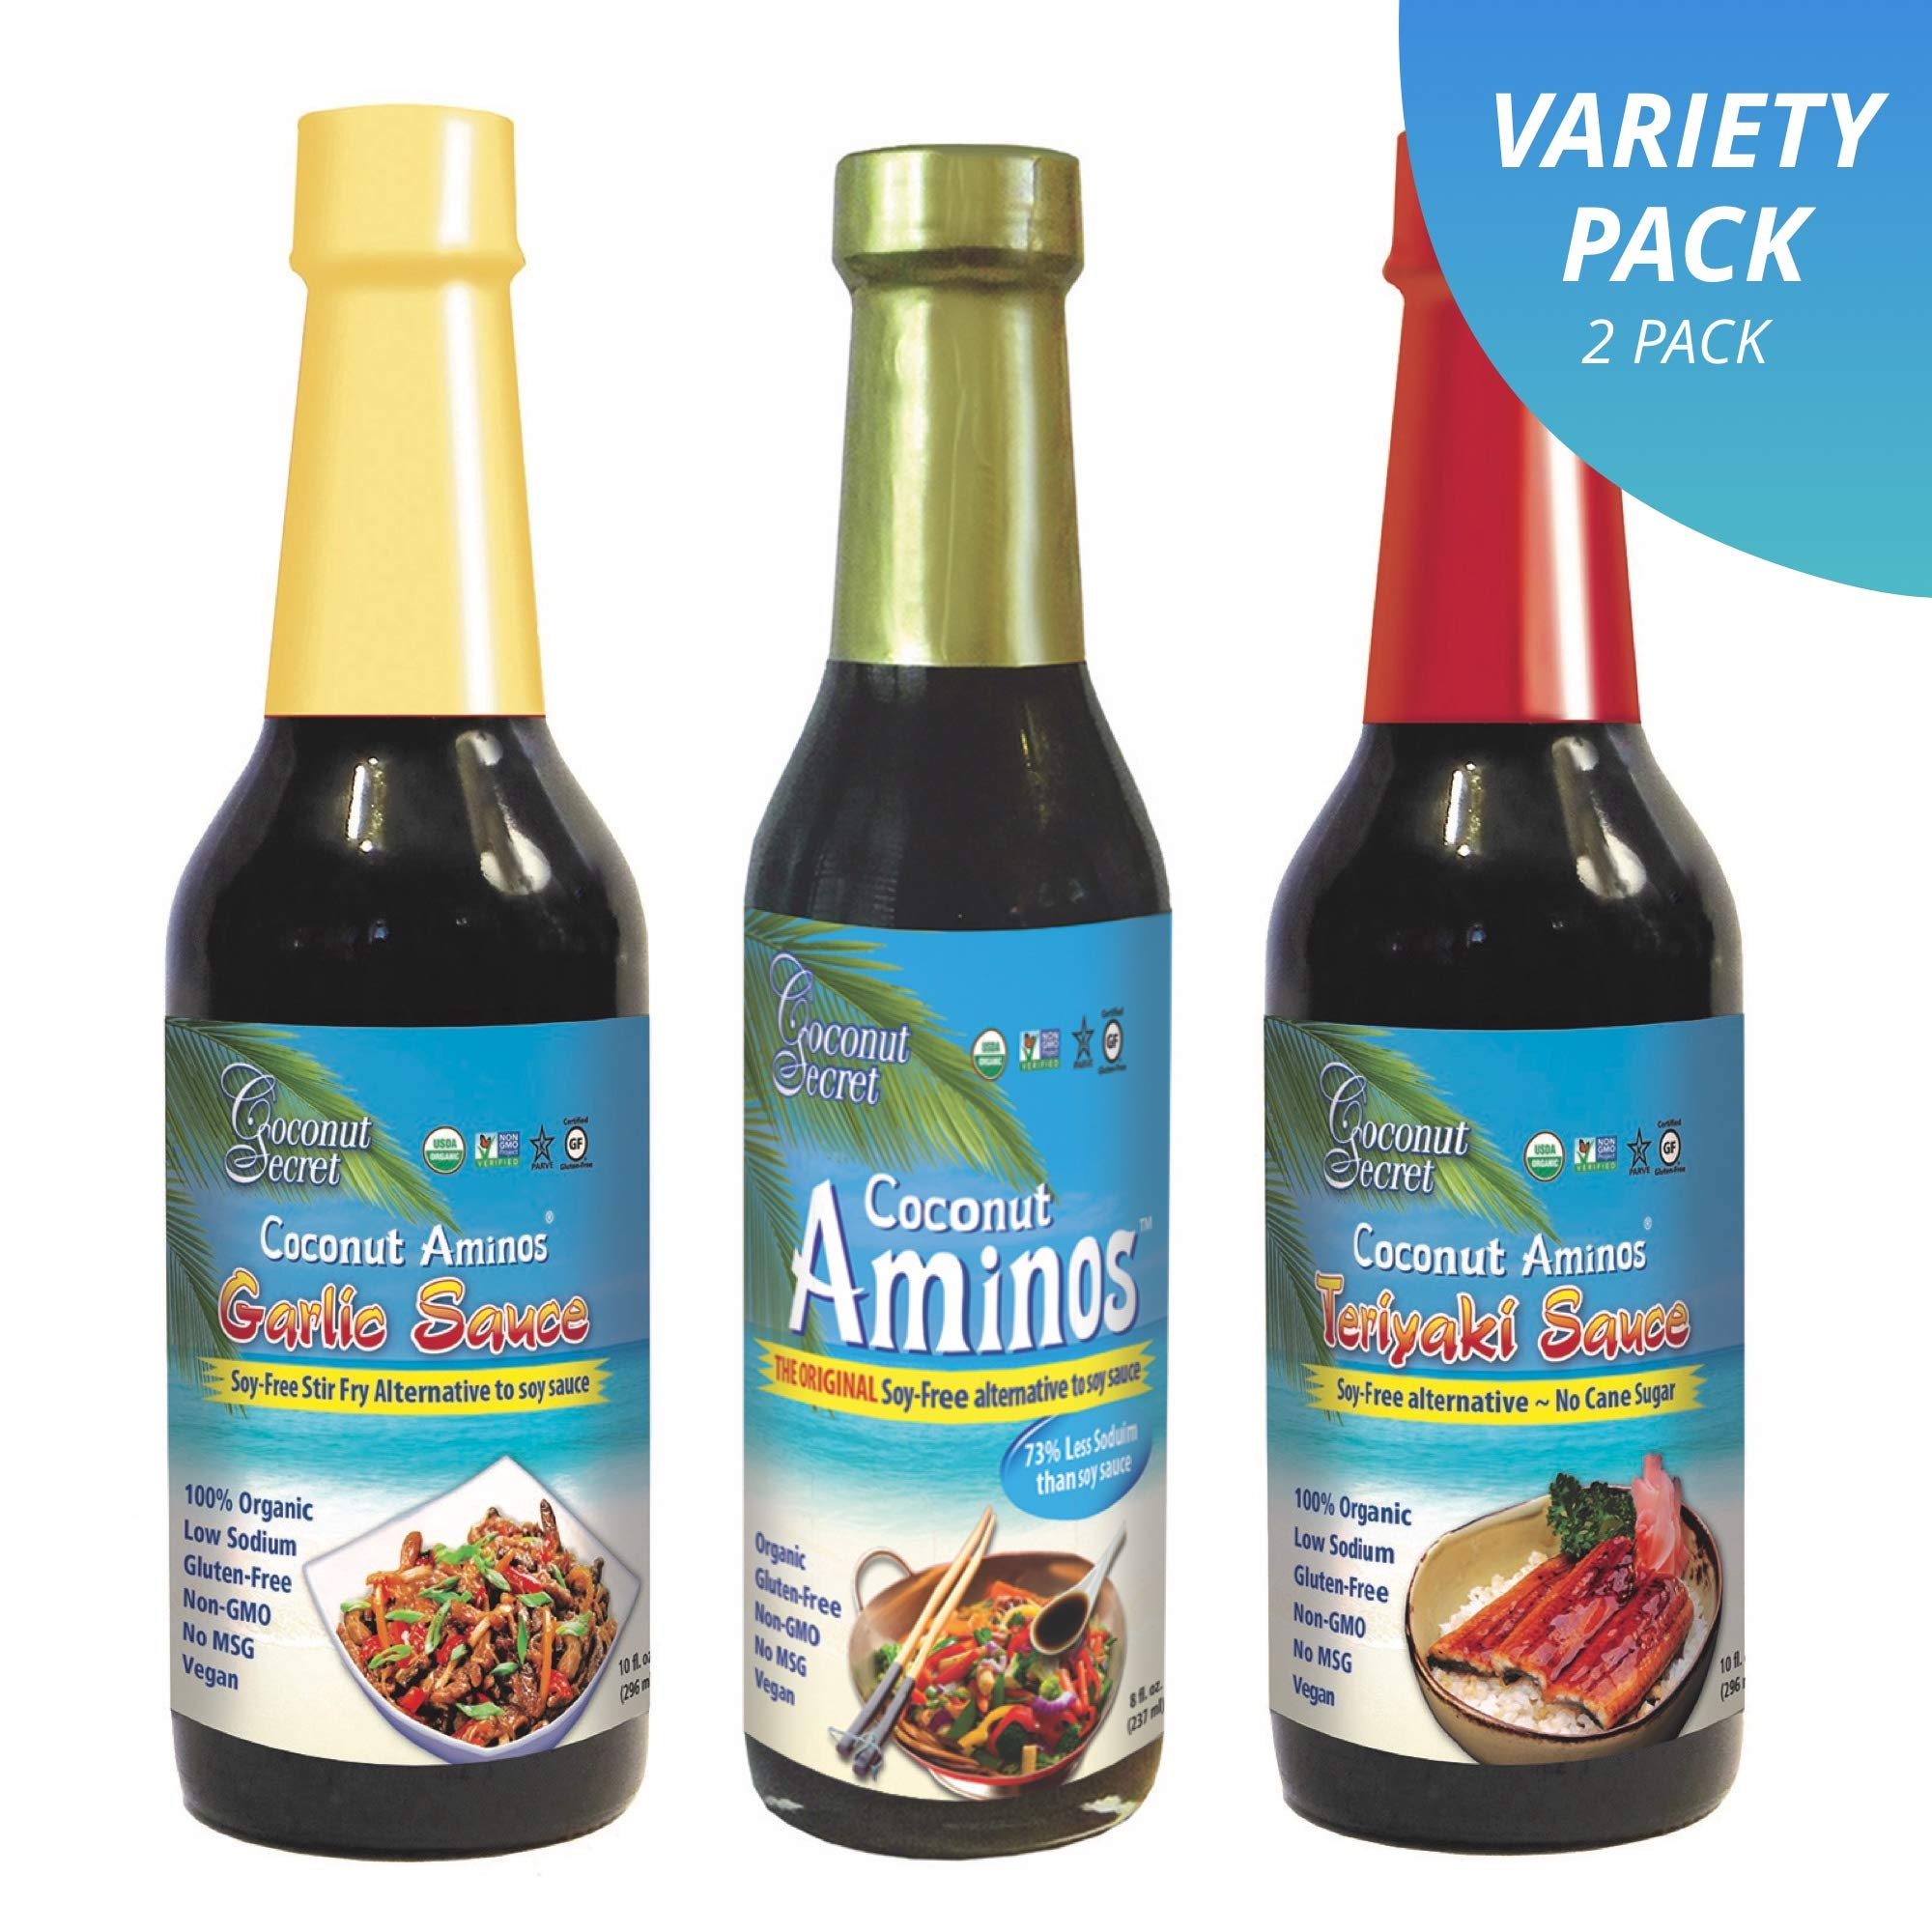 Coconut Secret Coconut Aminos Variety Pack - Coconut Aminos Original, Garlic Sauce & Teriyaki Sauce - 2 Each, 8-10 fl oz - Organic, Vegan, Non-GMO, Gluten-Free, Kosher - 256 Total Servings by Coconut Secret